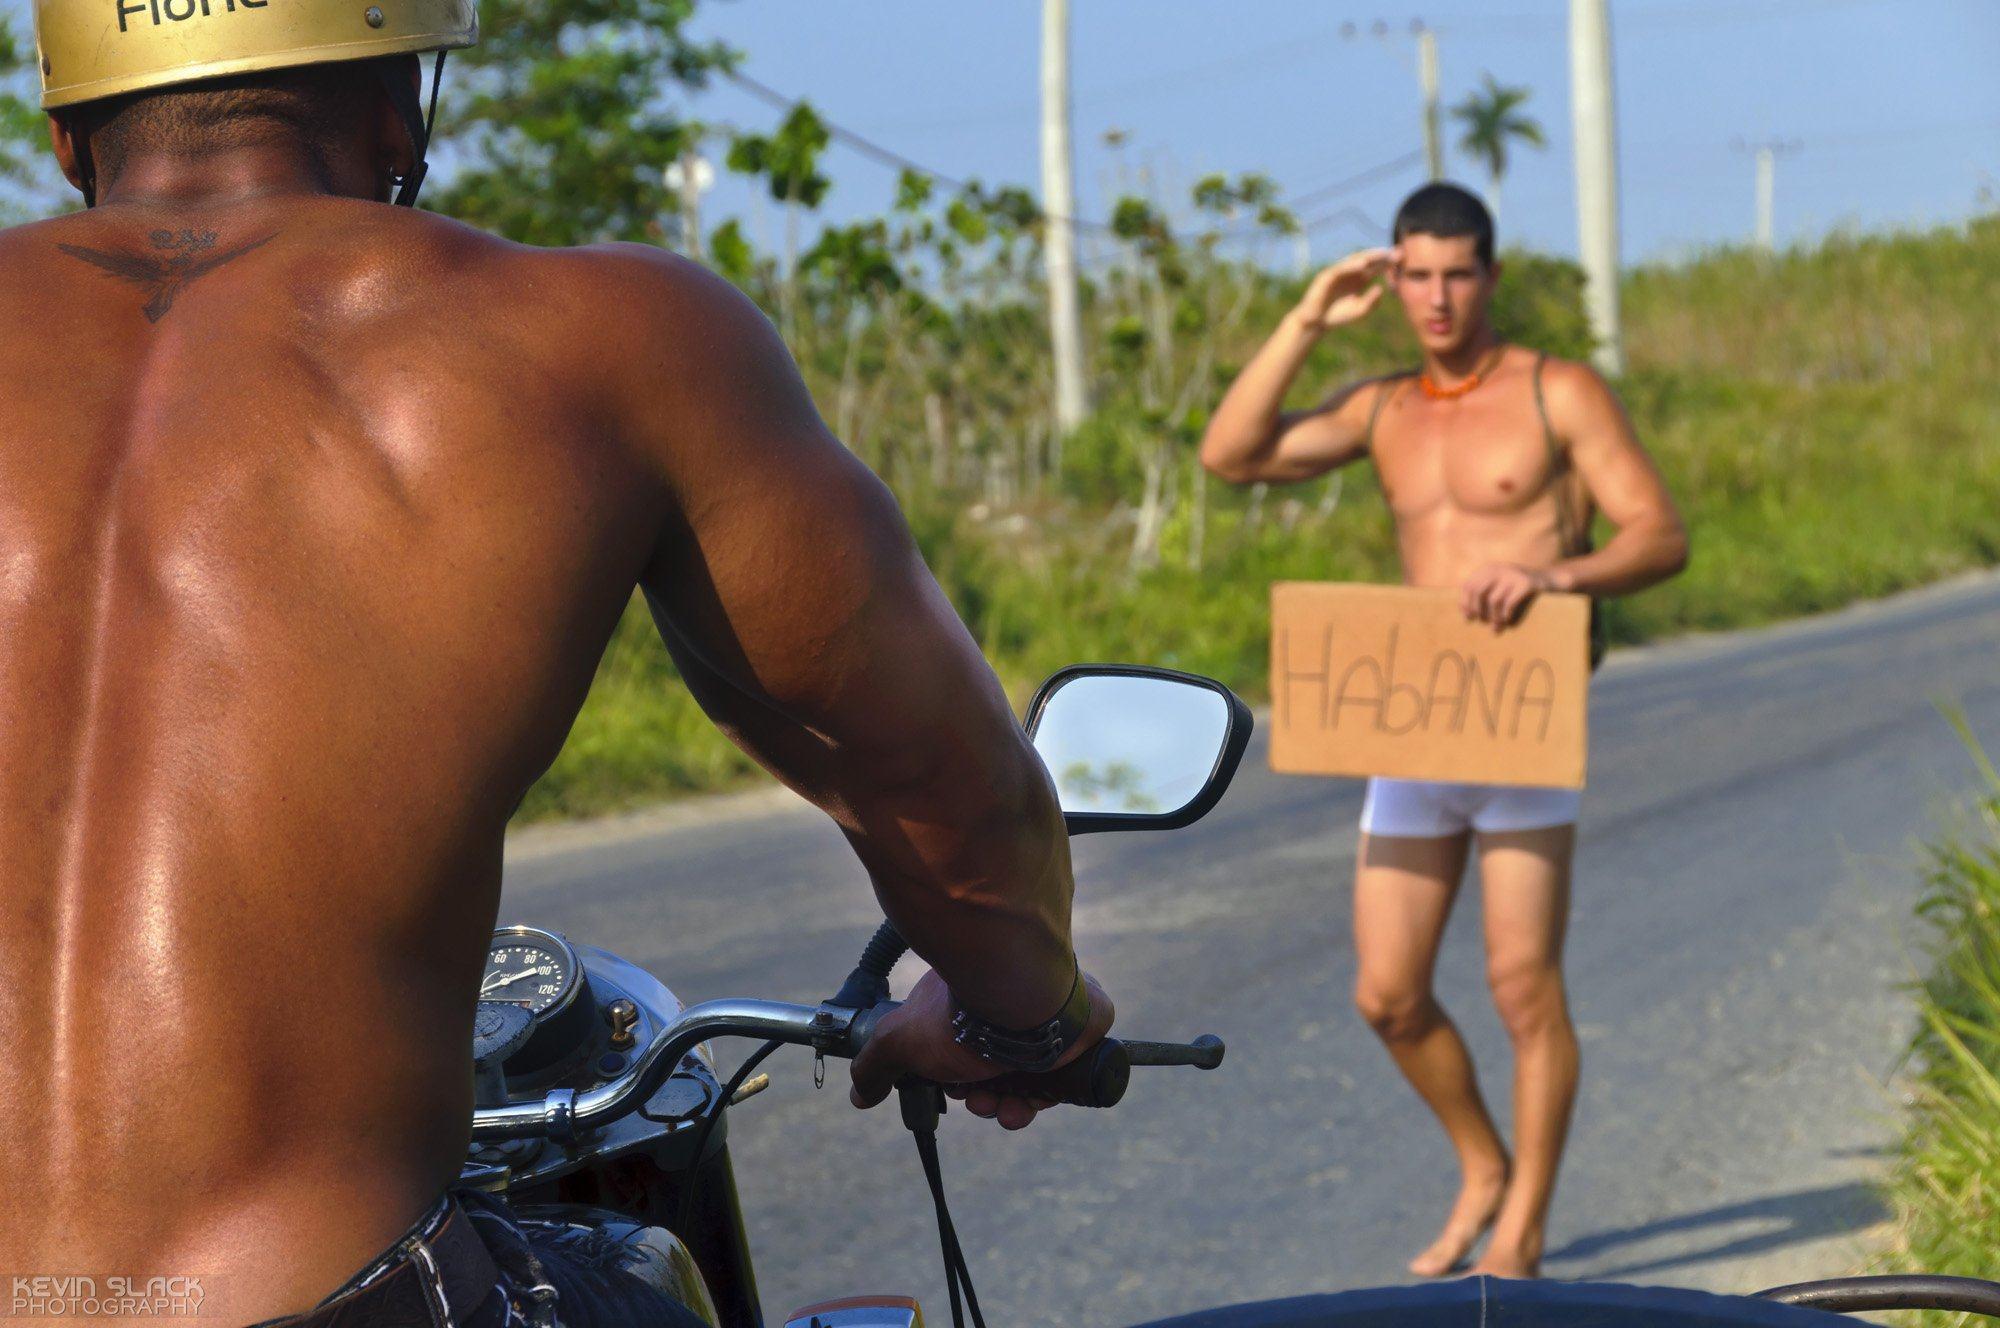 Hitchhike Habana Outtakes #26